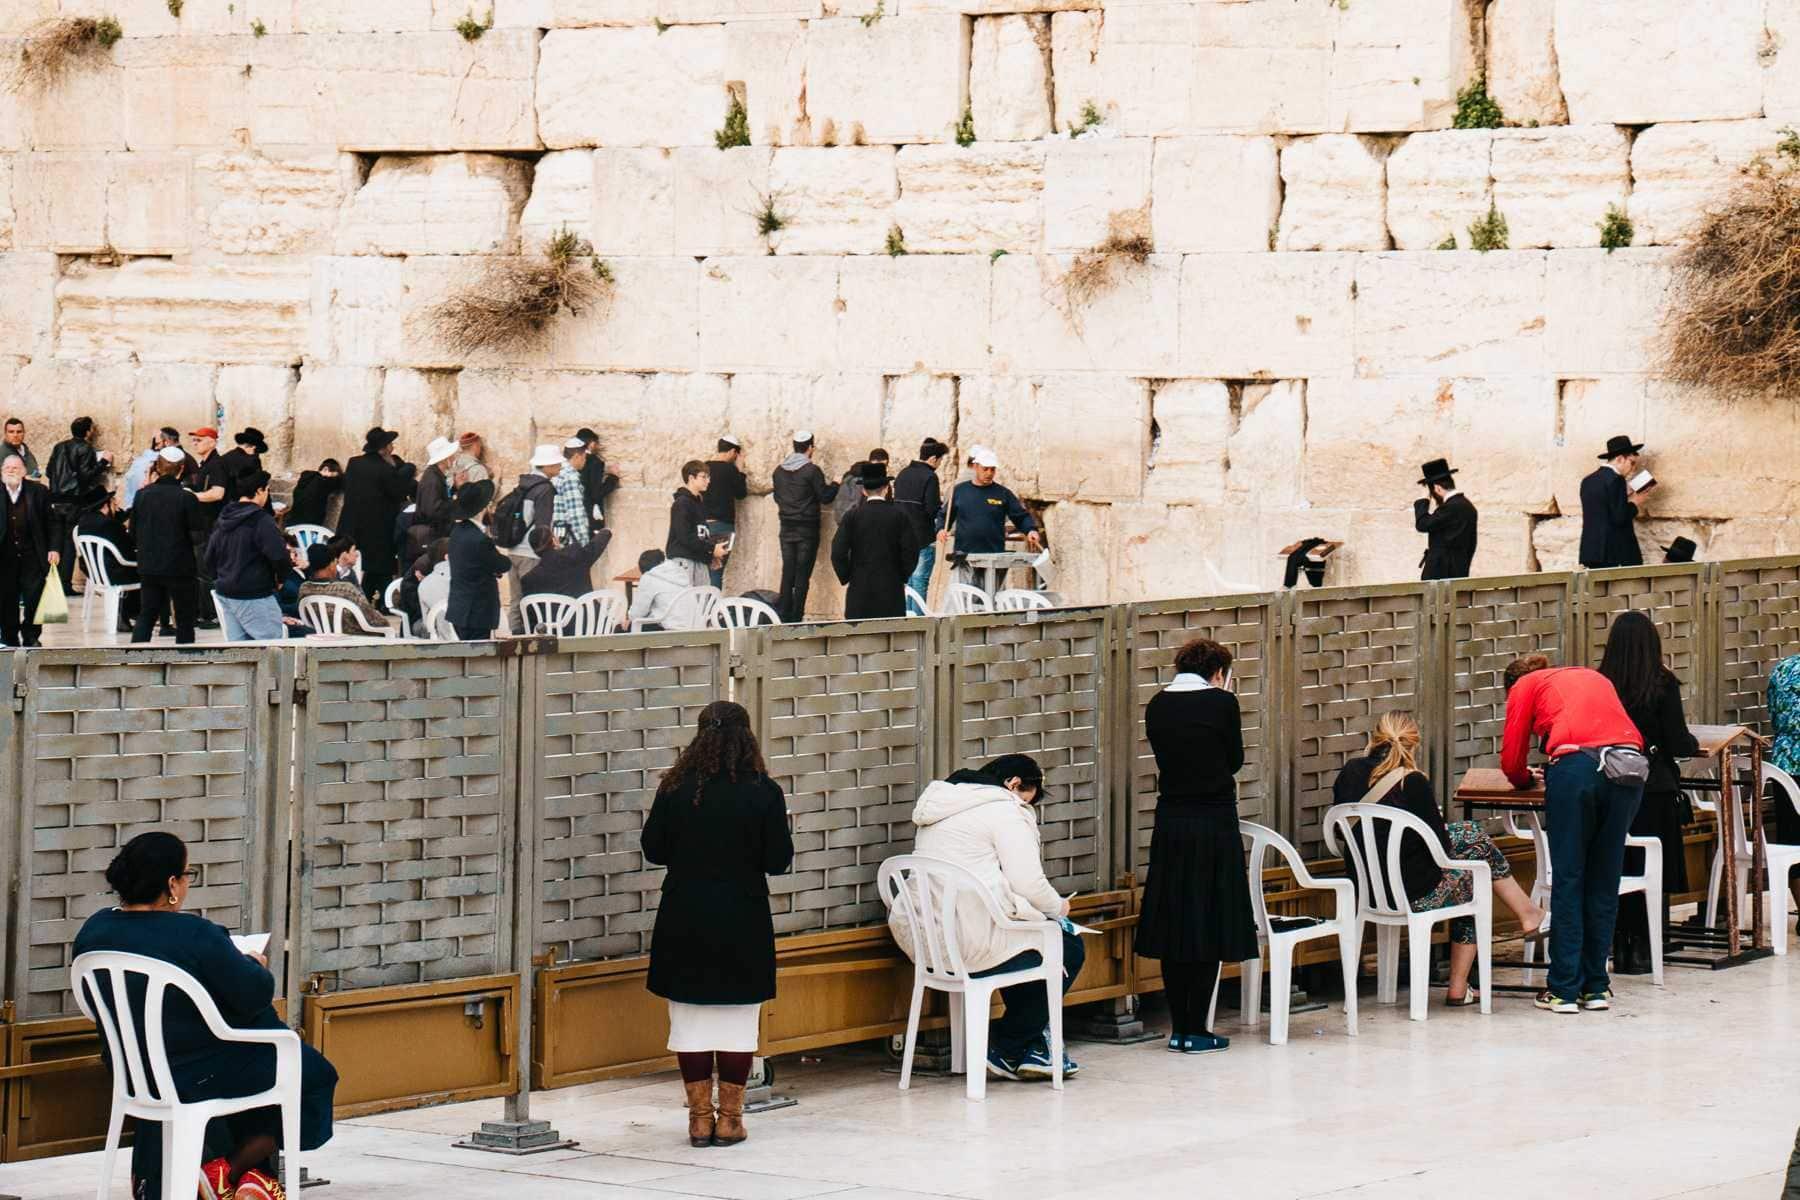 Trennung Frauen Männer Klagemauer Jerusalem